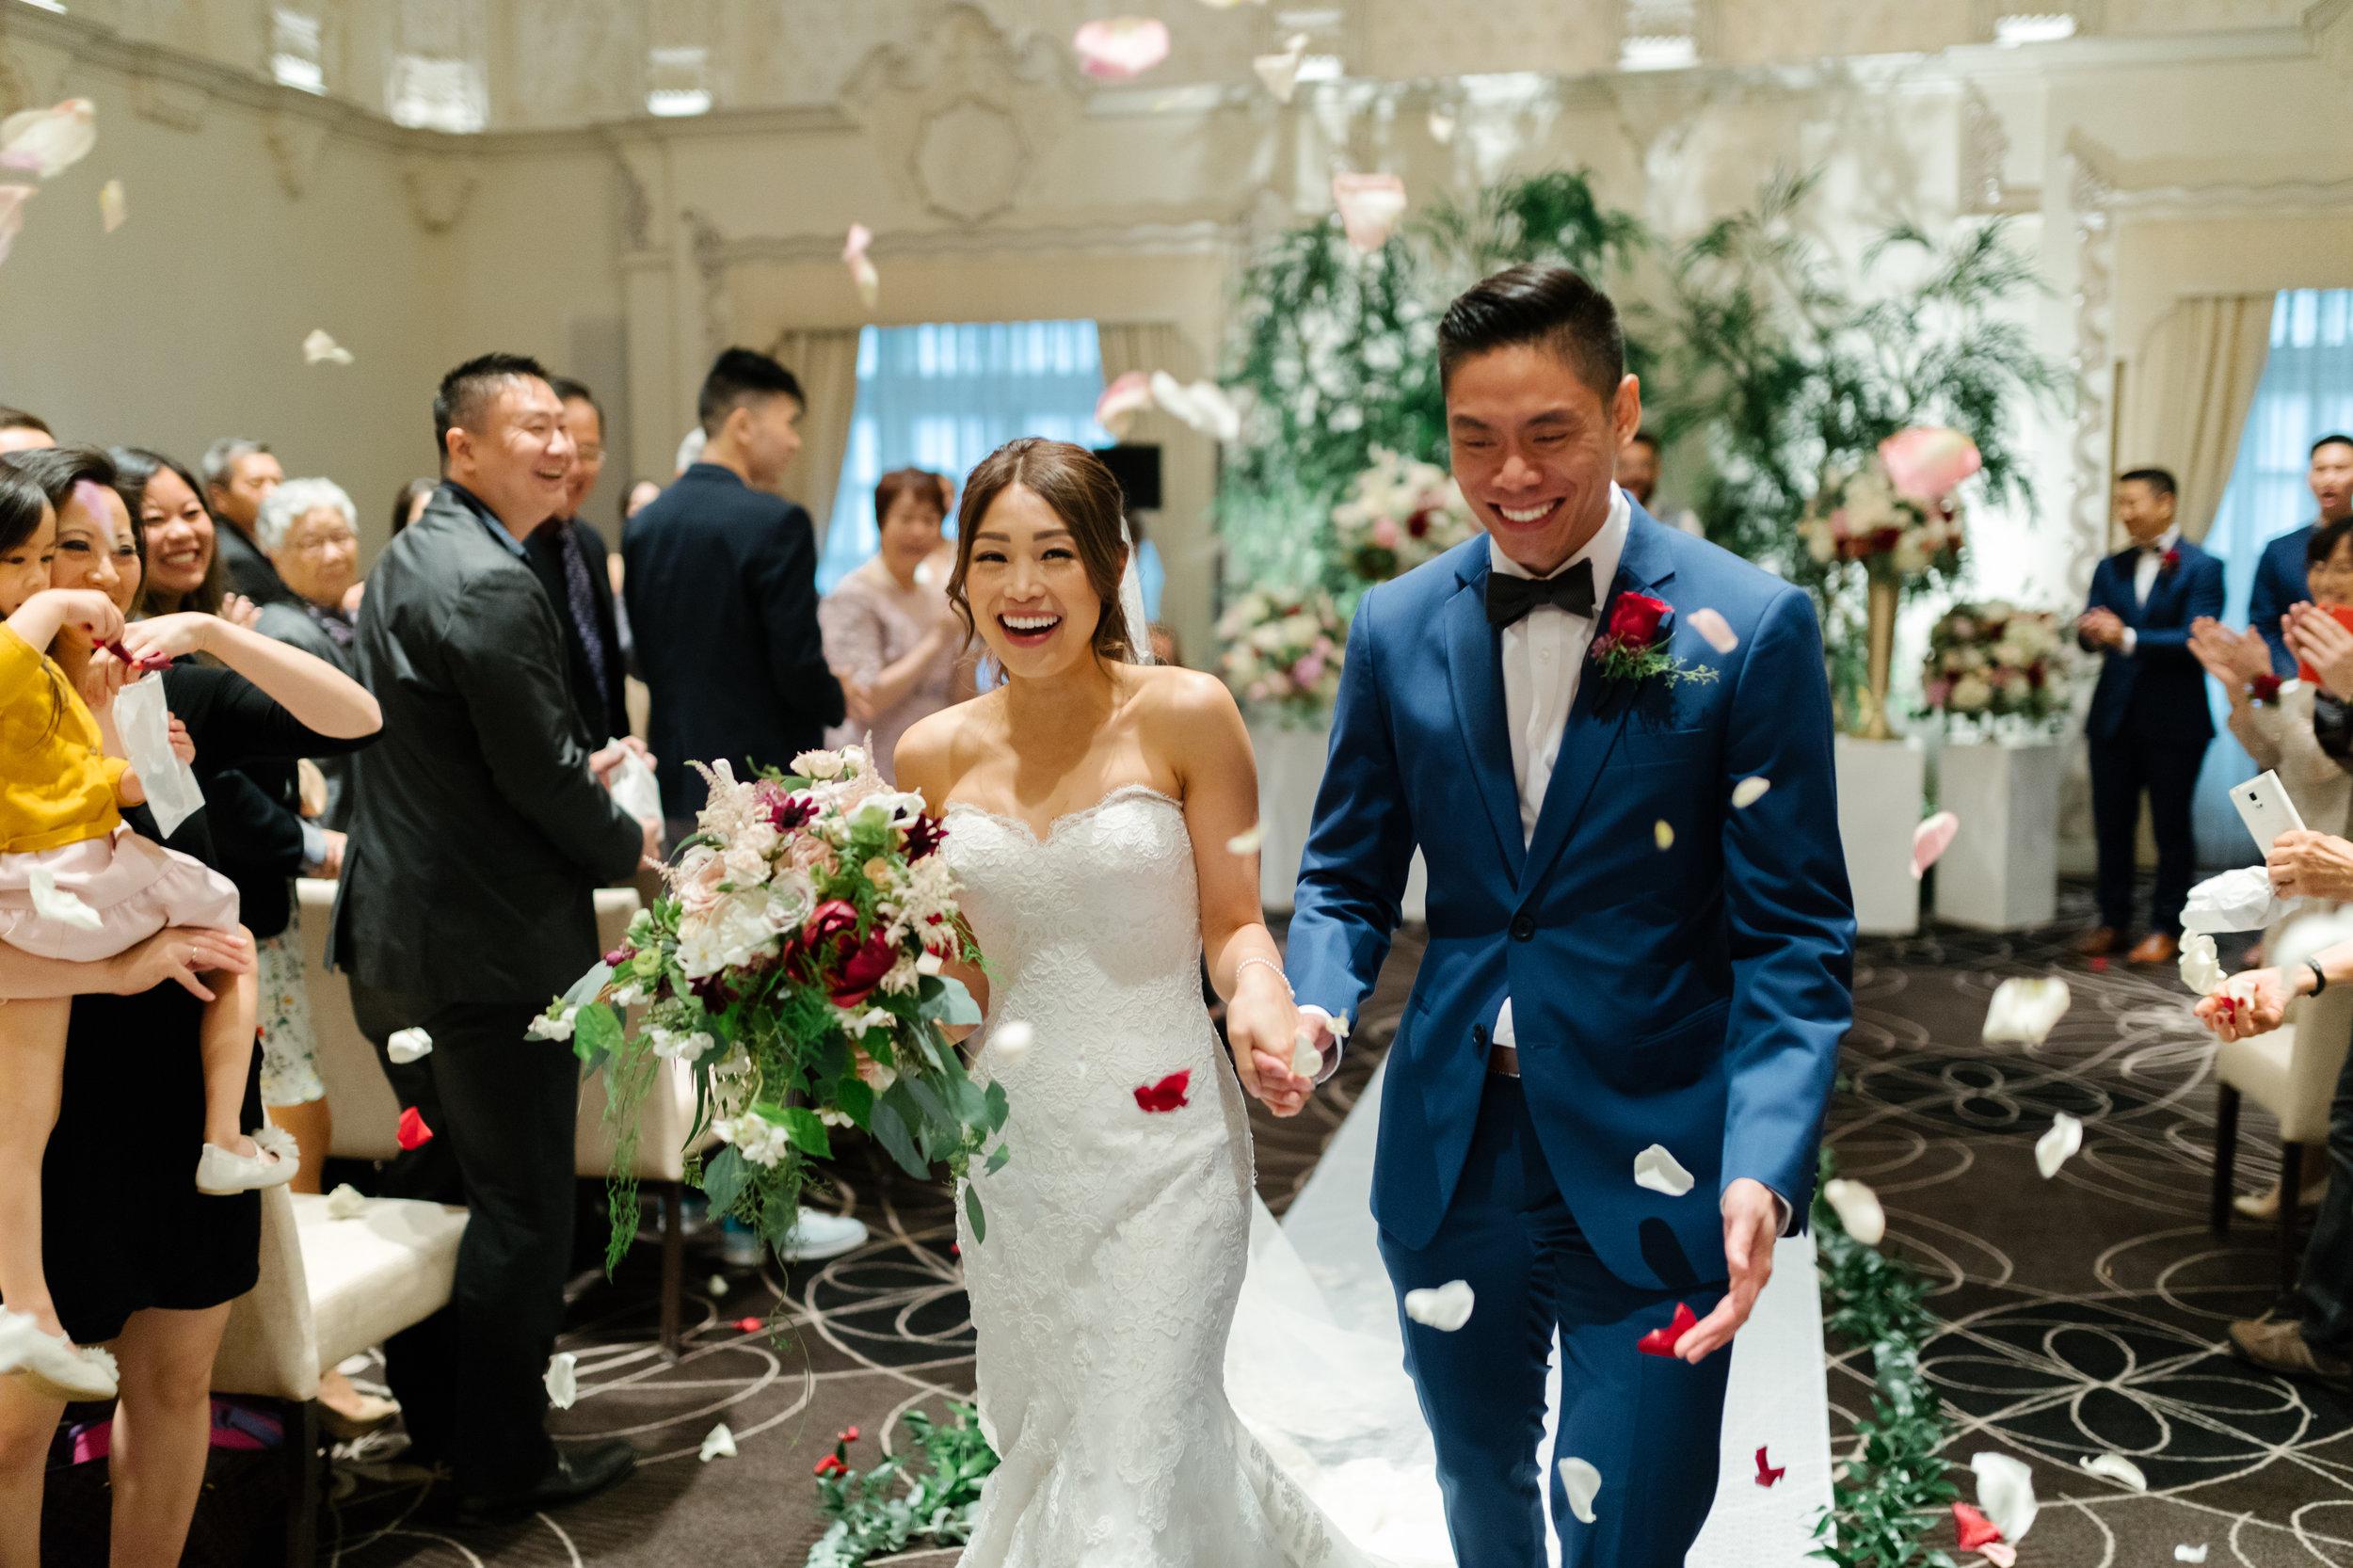 herafilms_wedding_betty_esmond_hera_selects-36.jpg